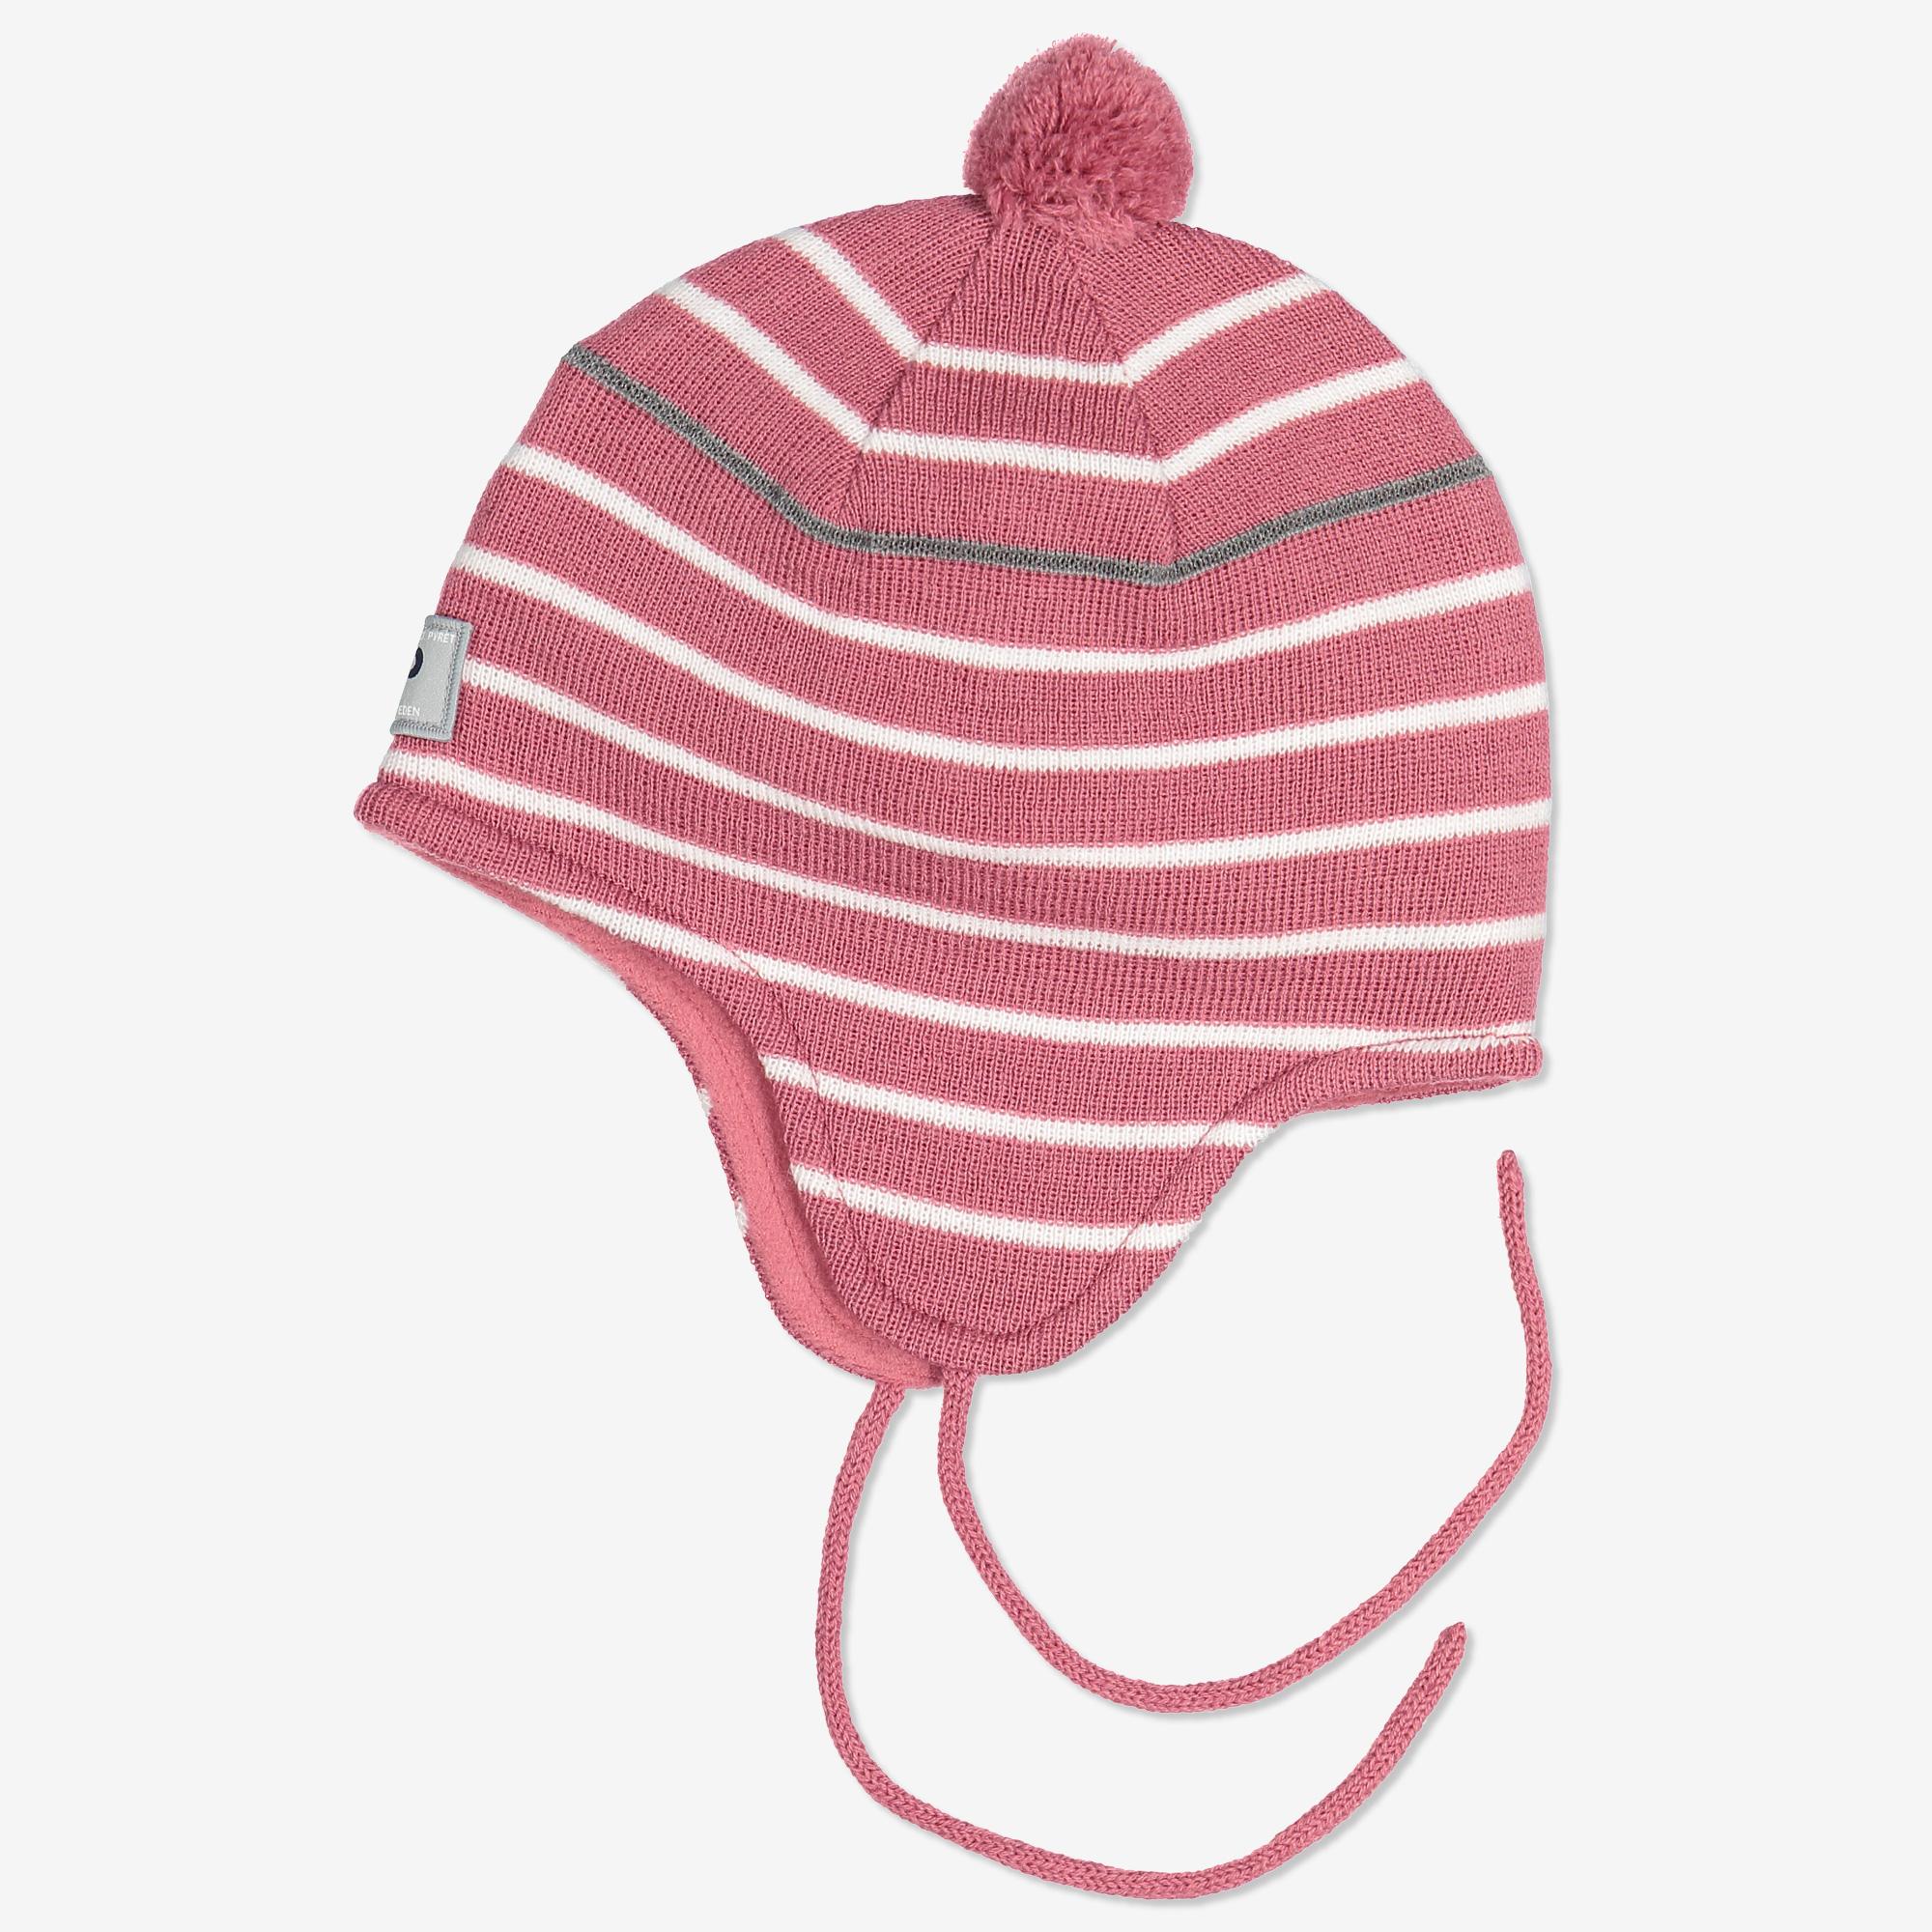 Vauvan raidallinen pipo vaaleanpunainen  8e185022e2